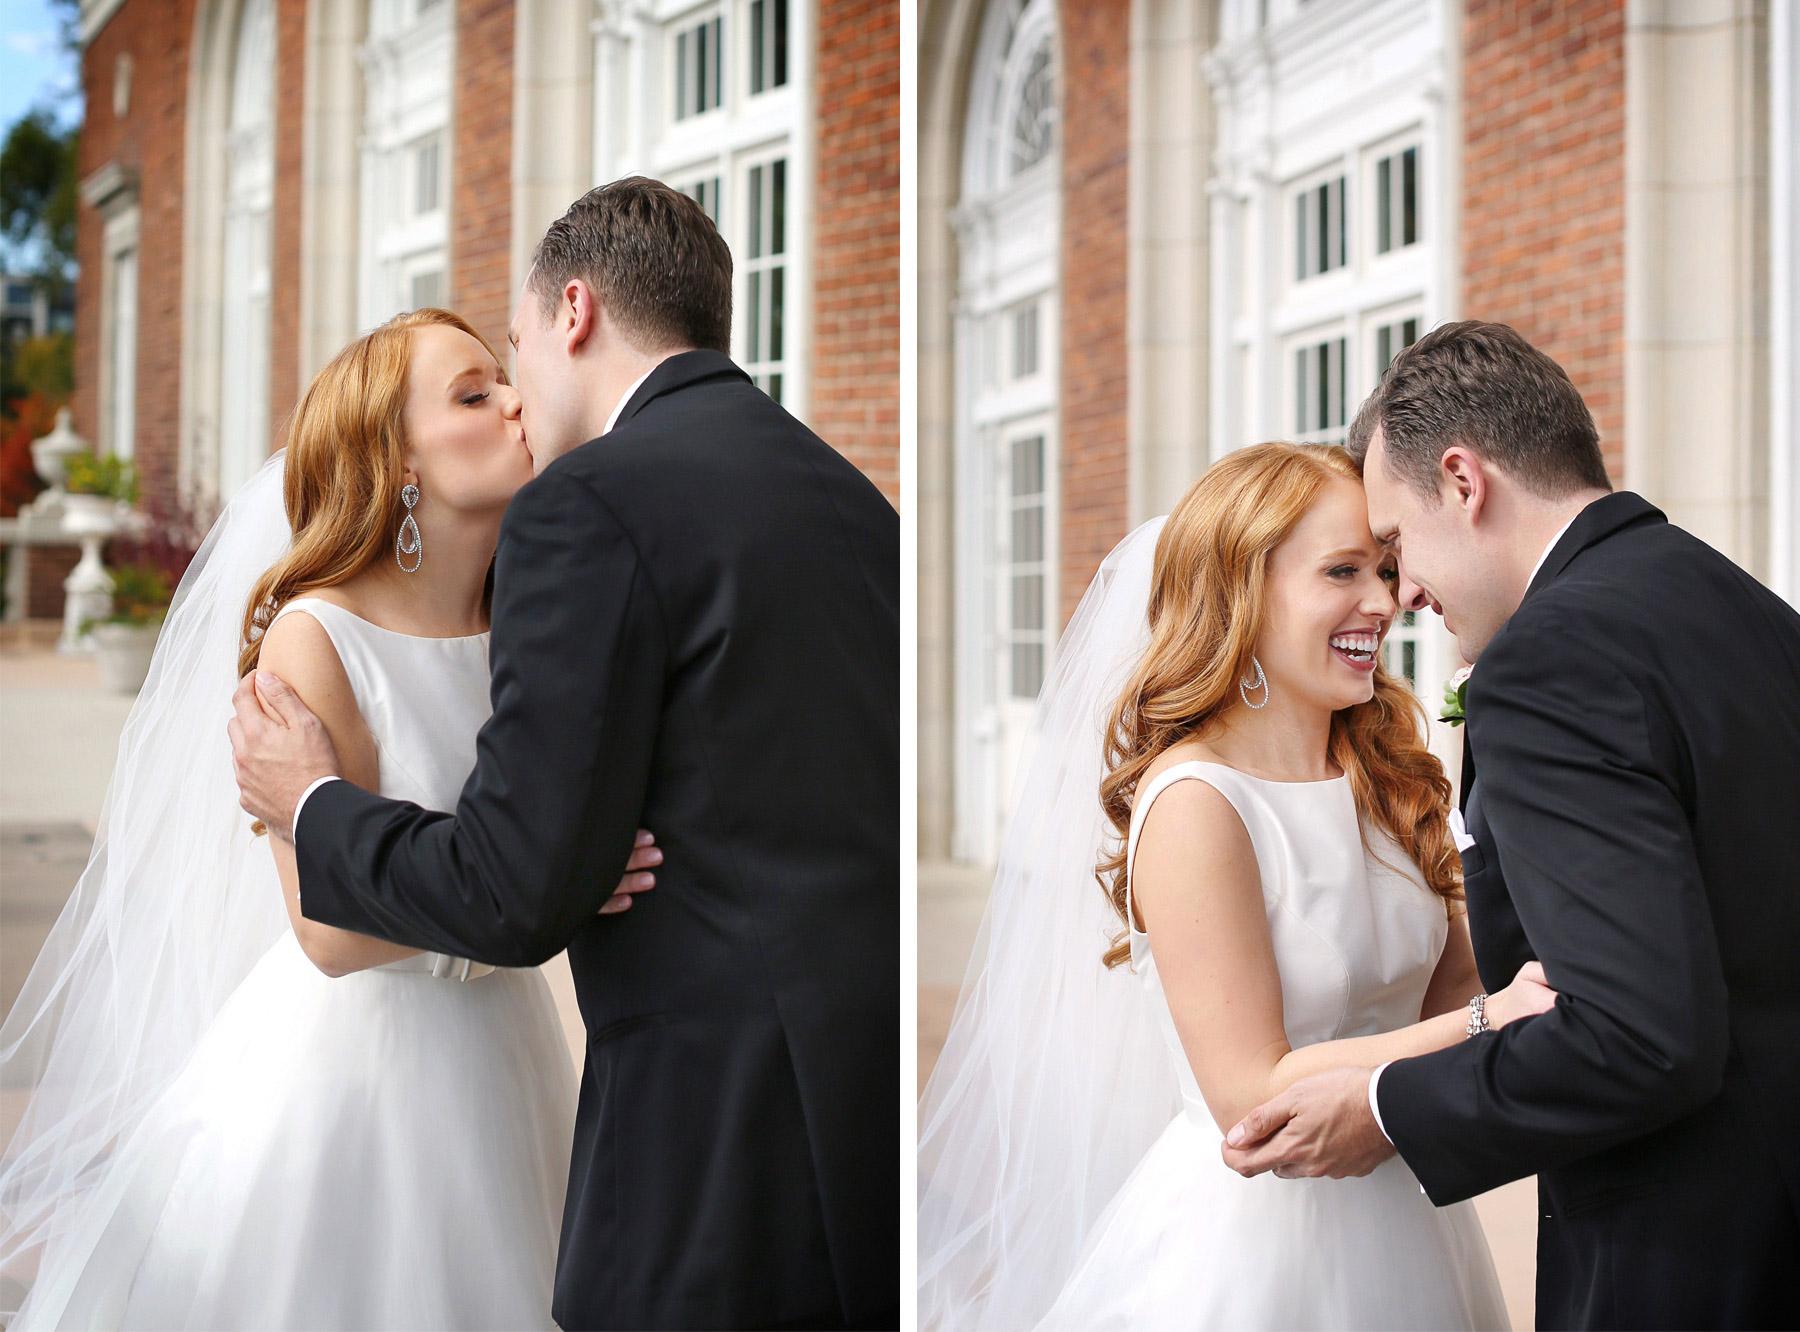 08-Minneapolis-Minnesota-Wedding-Photographer-by-Andrew-Vick-Photography-Fall-Autumn-Calhoun-Beach-Club-First-Look-Meeting-Bride-Groom-Terrace-Kiss-Kristy-and-Jack.jpg